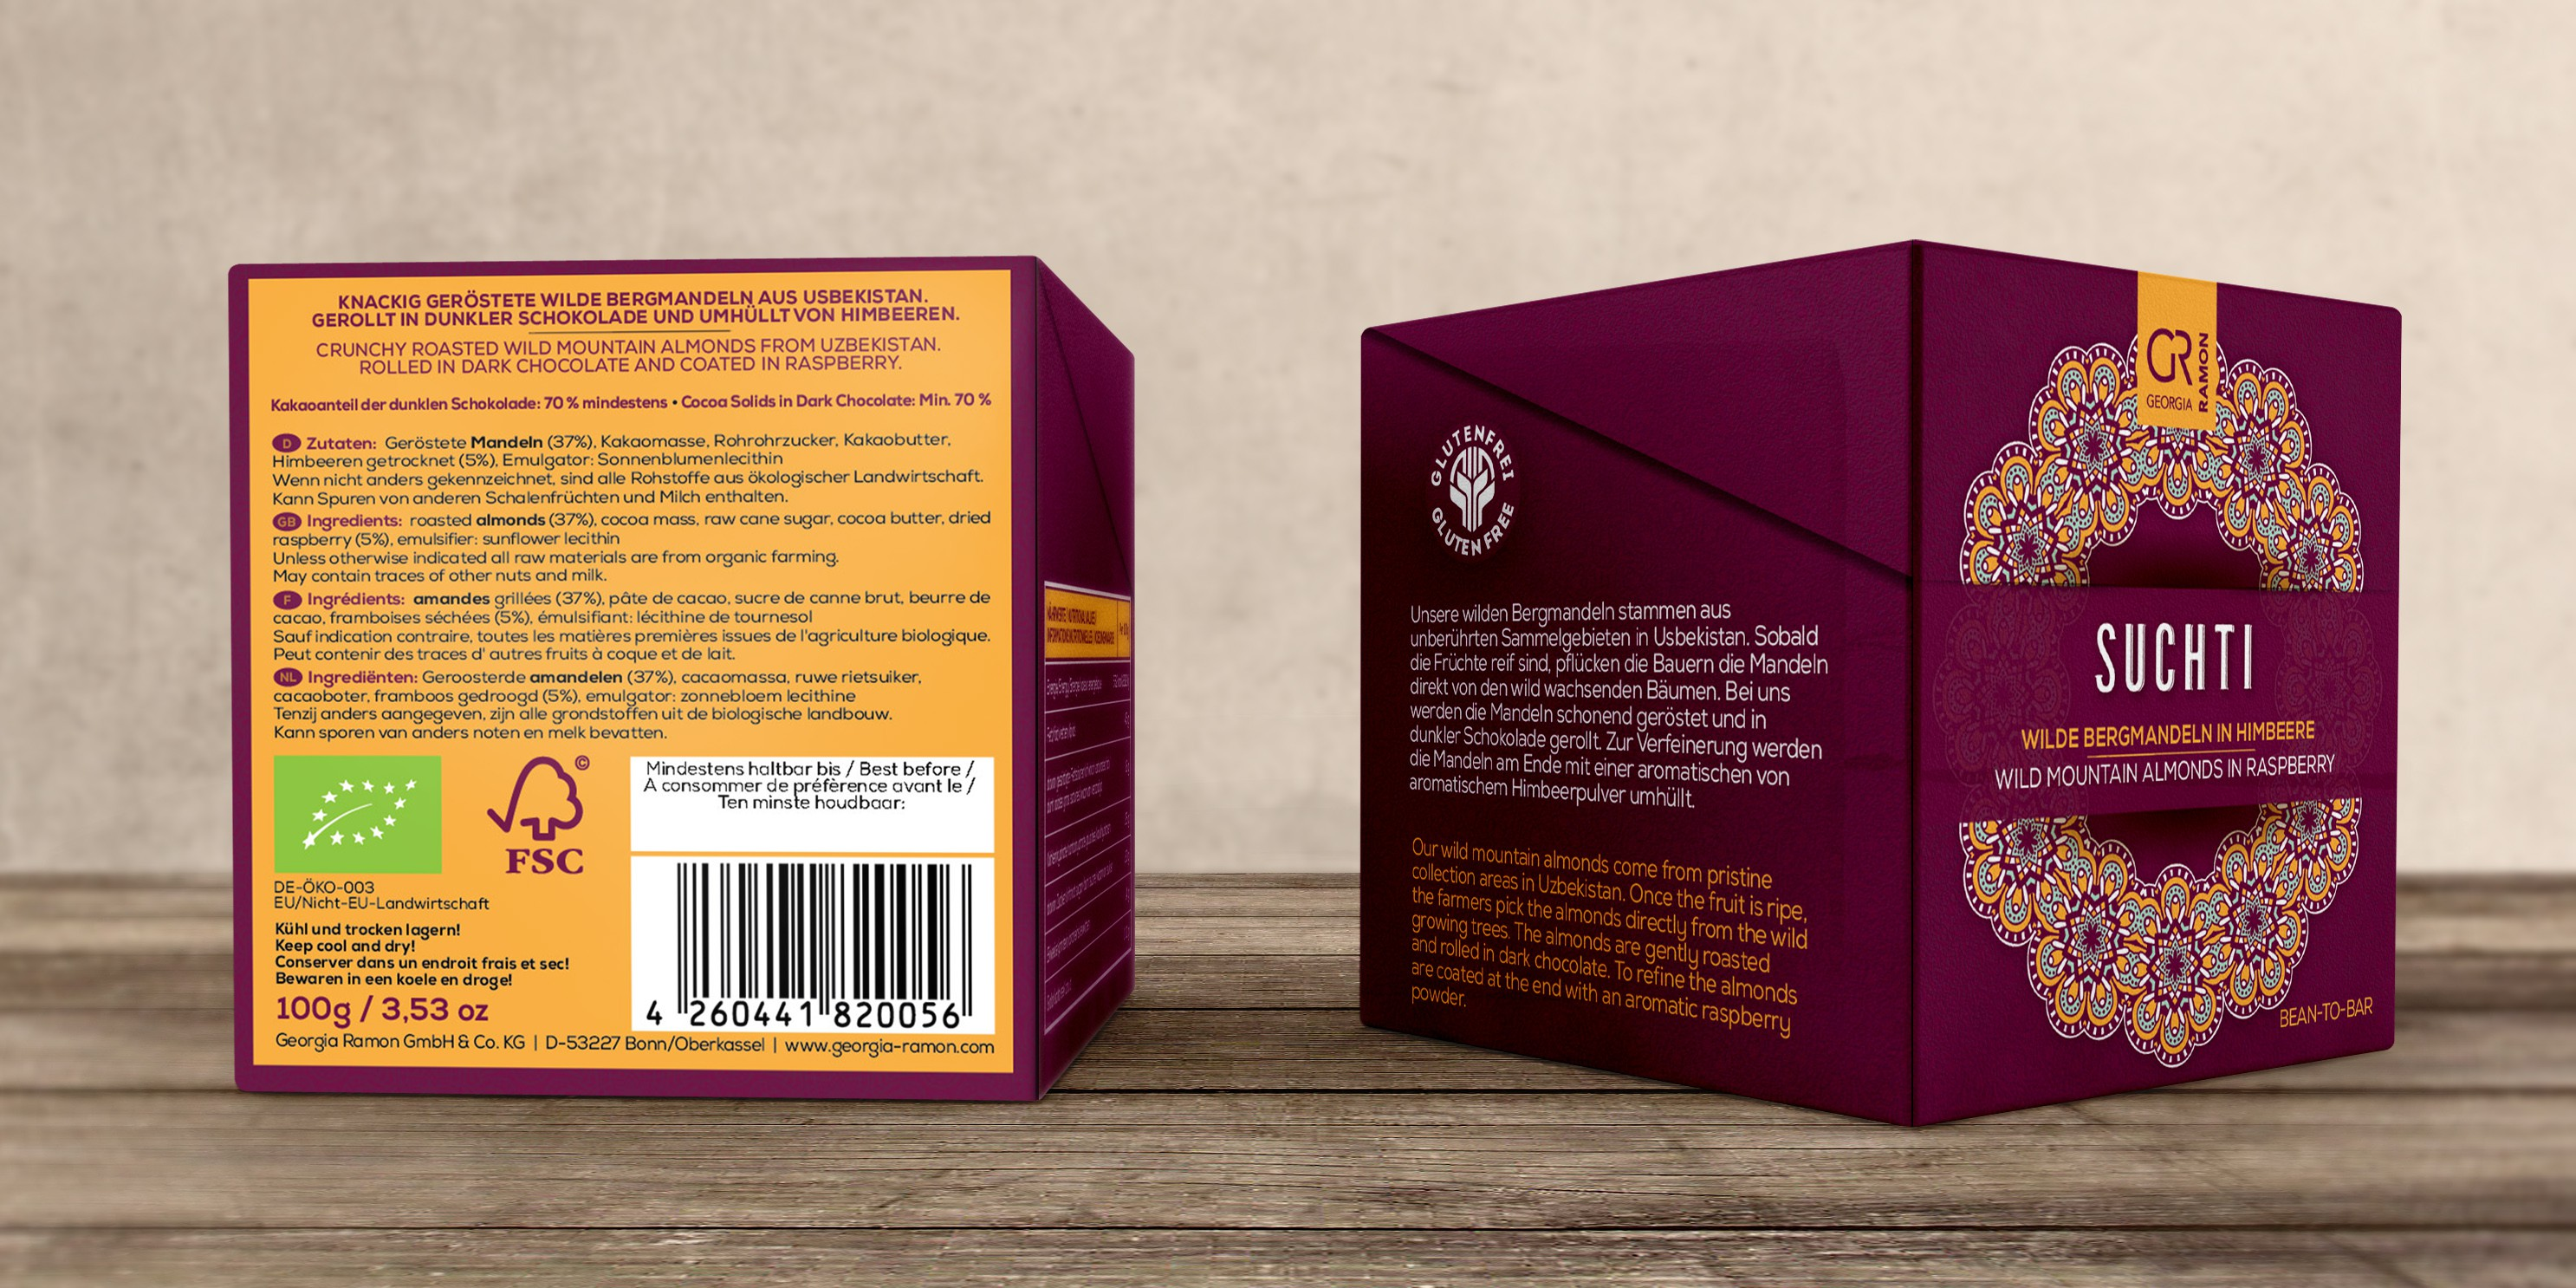 5 Suchti-labels